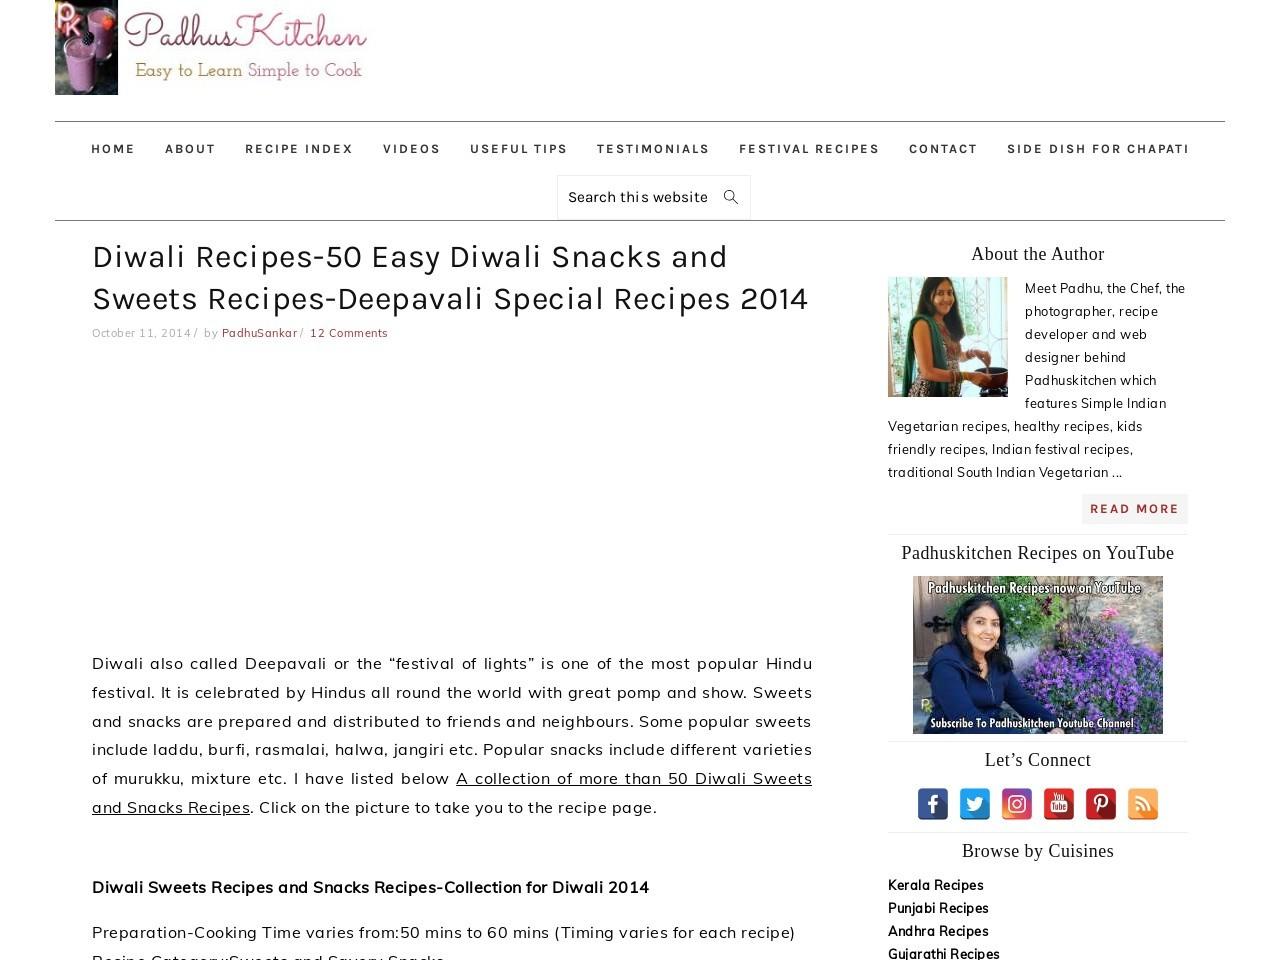 Diwali Recipes-50 Easy Diwali Snacks and Sweets Recipes …